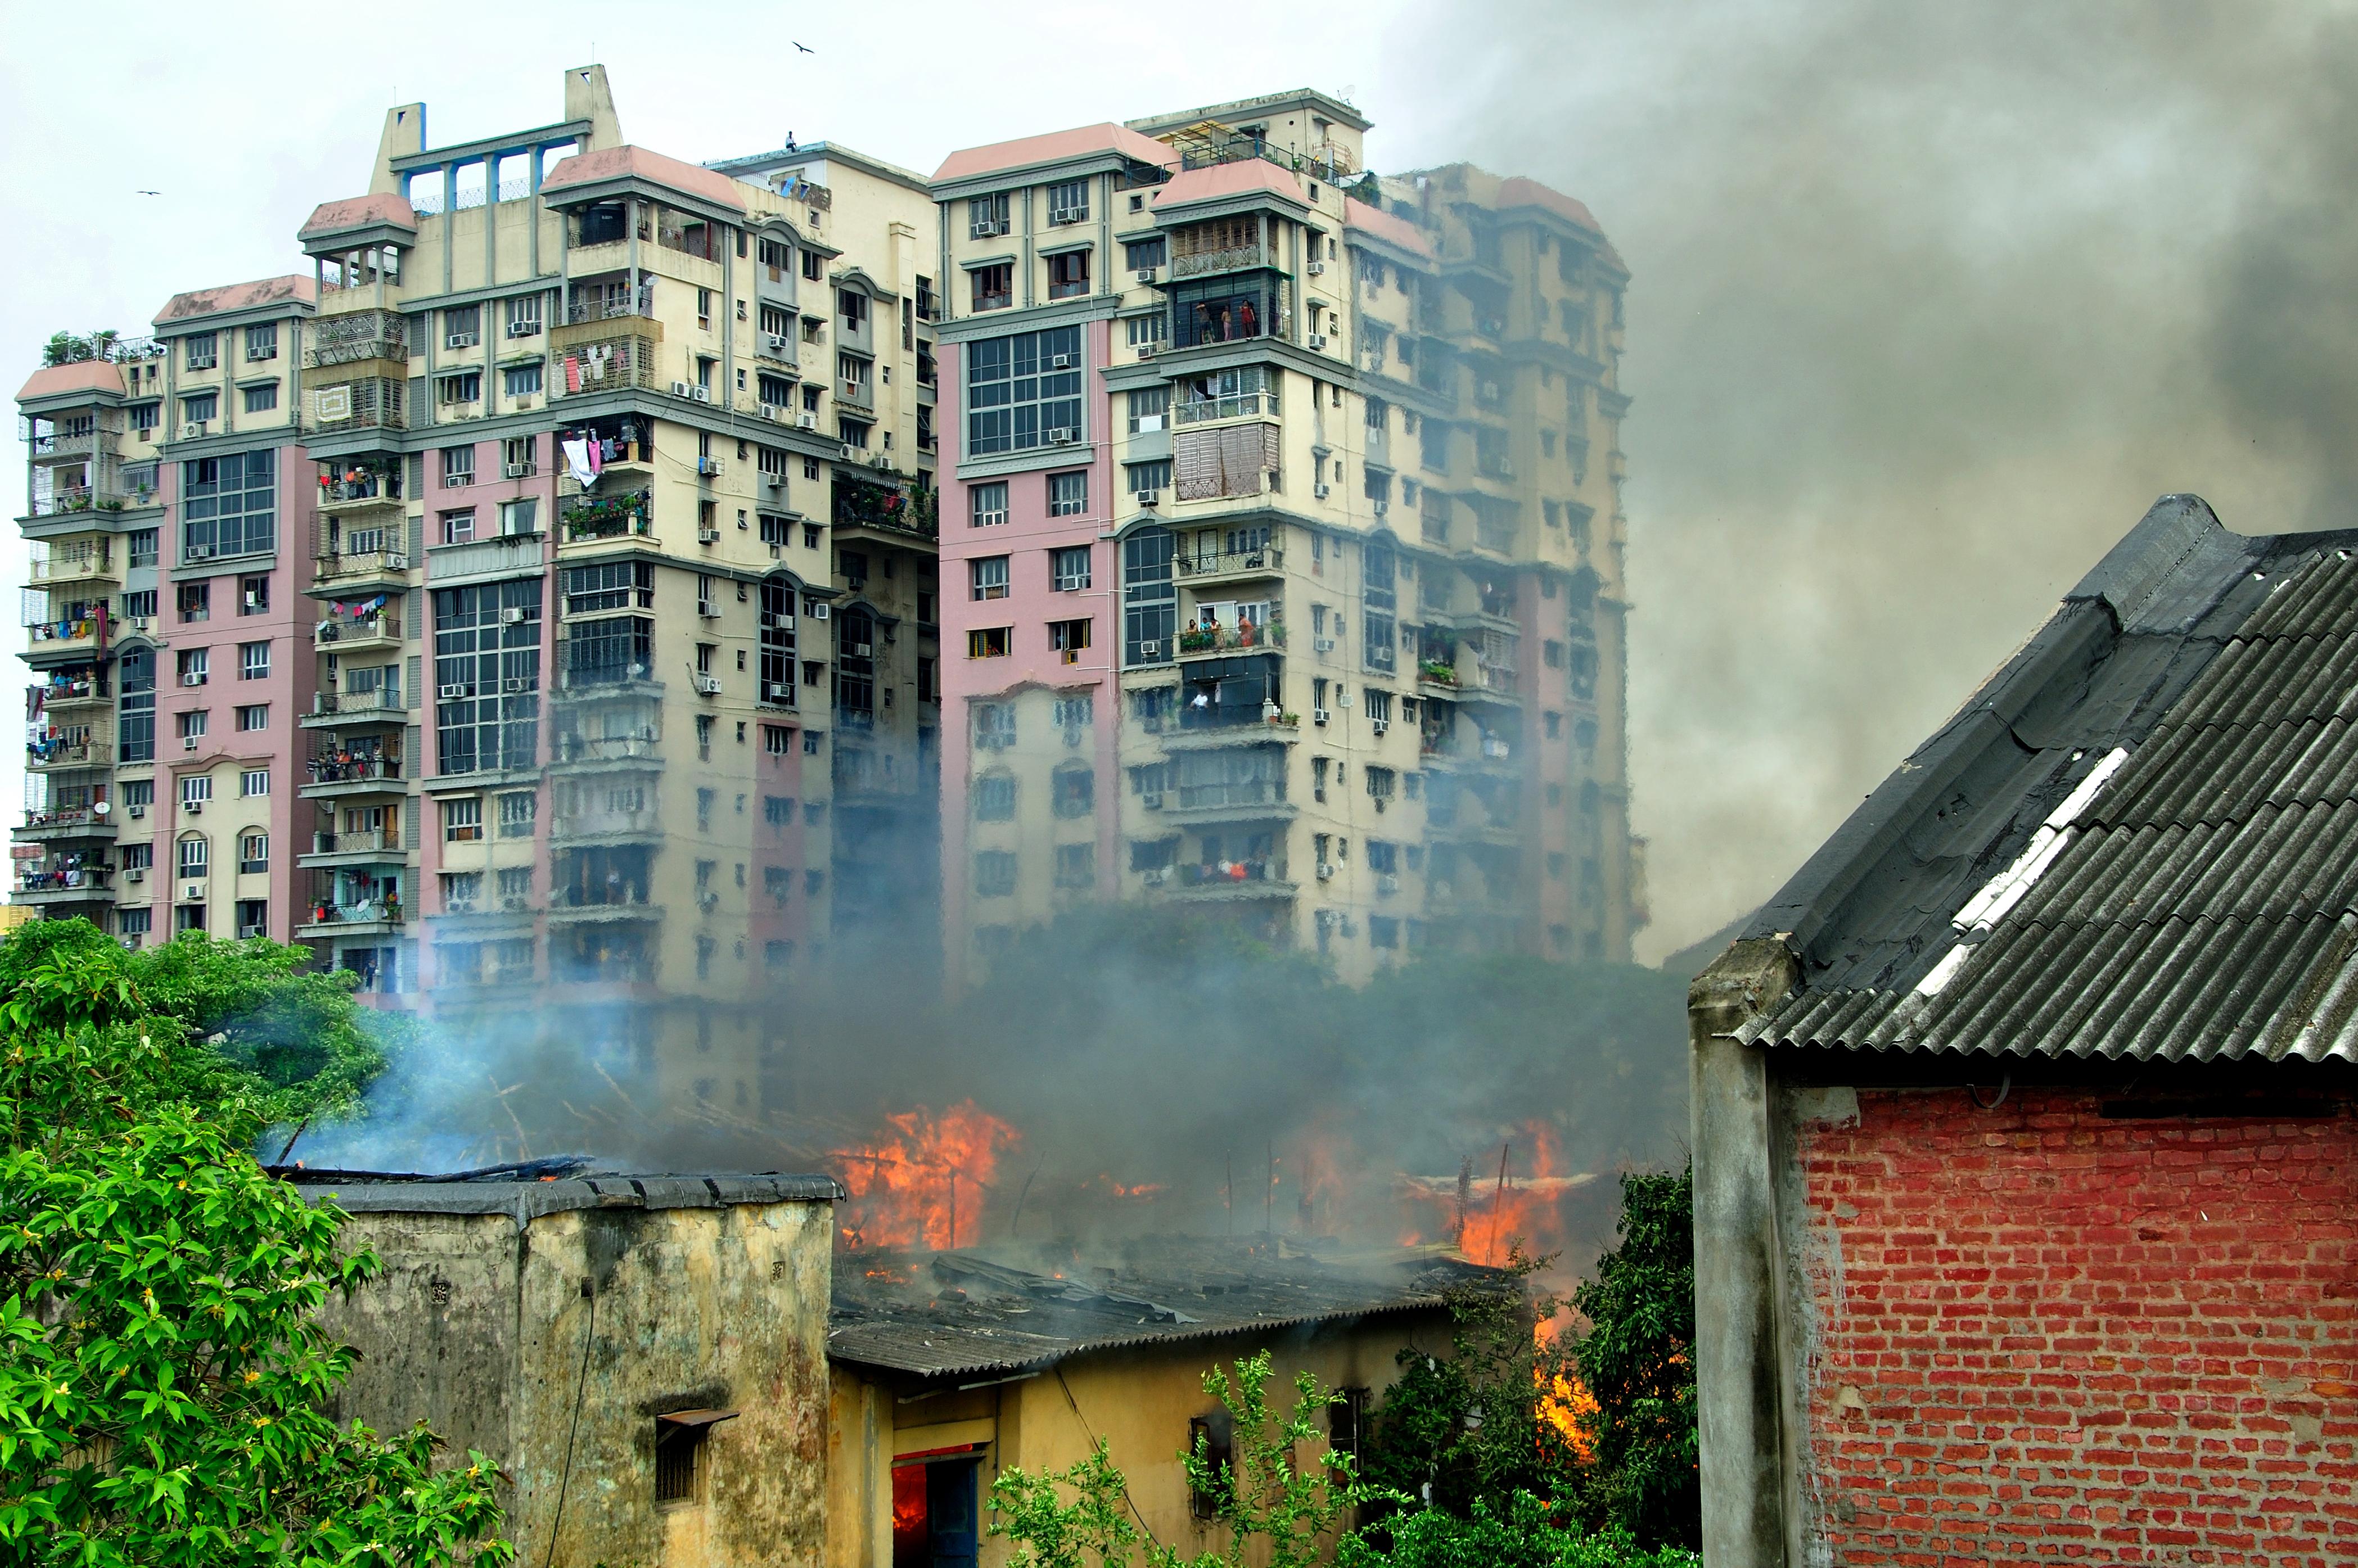 Fire, Buildings, Danger, Flames, Smoke, HQ Photo